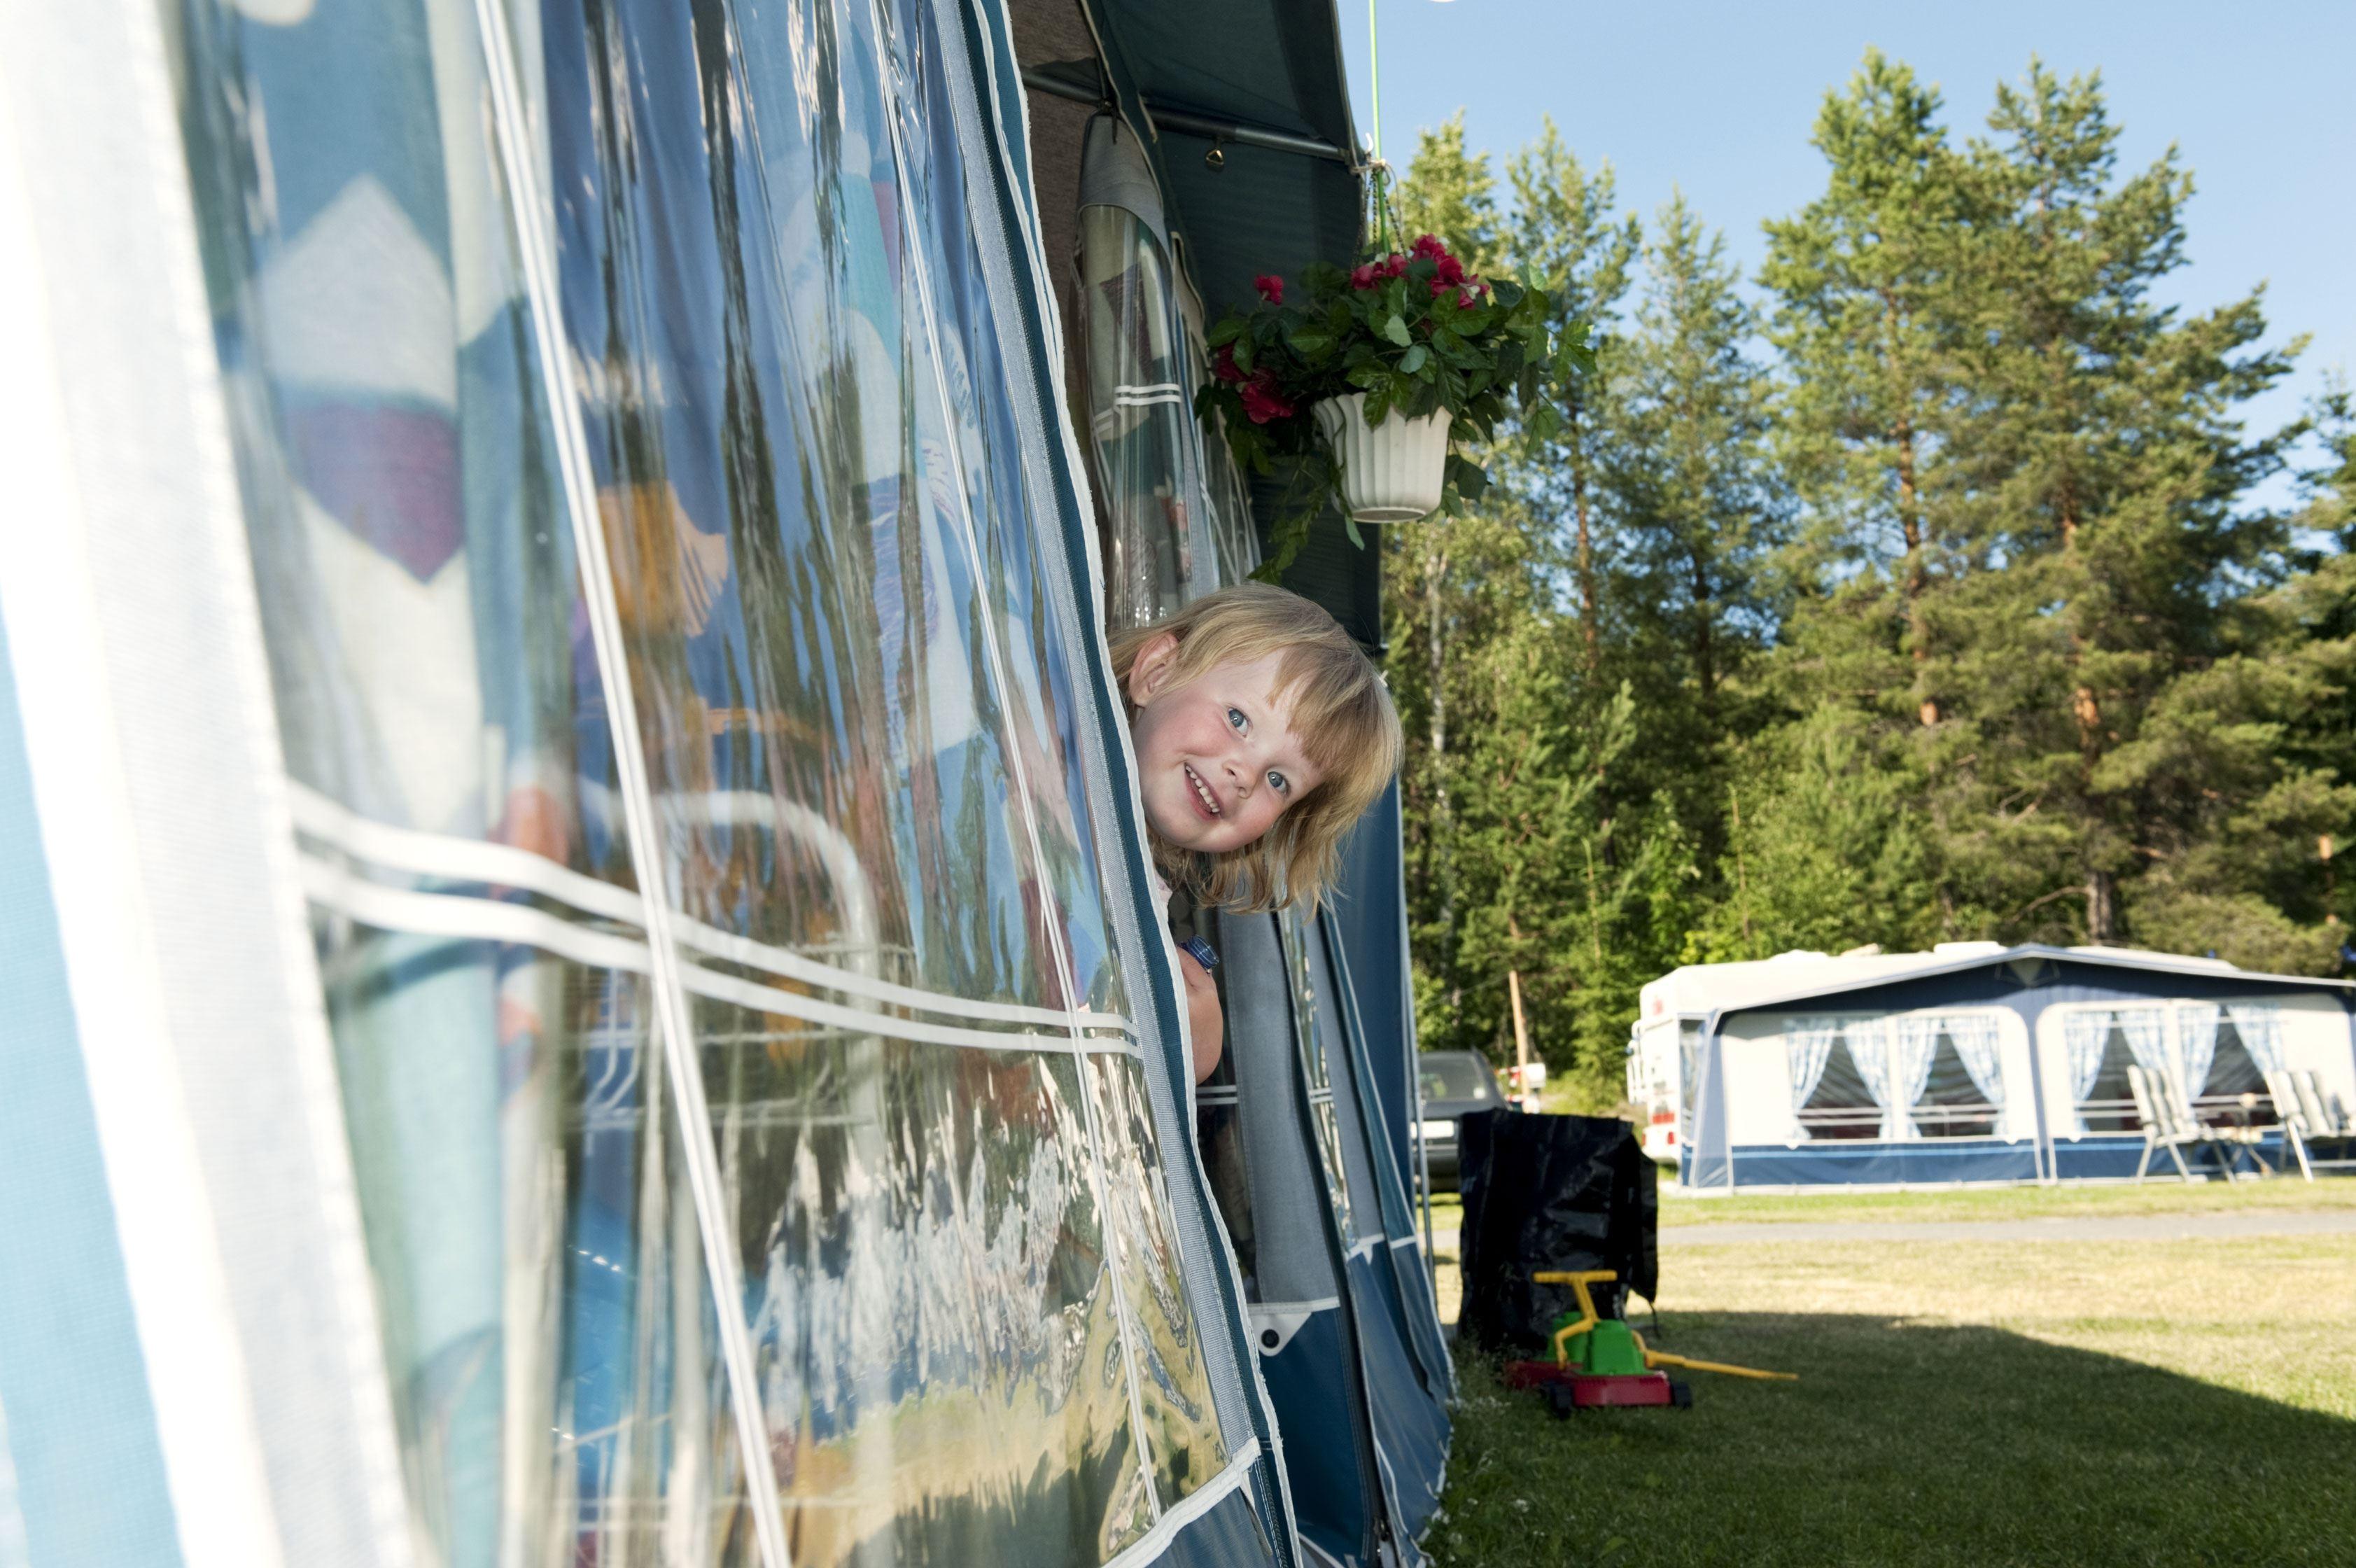 Skellefteå Camping/Camping